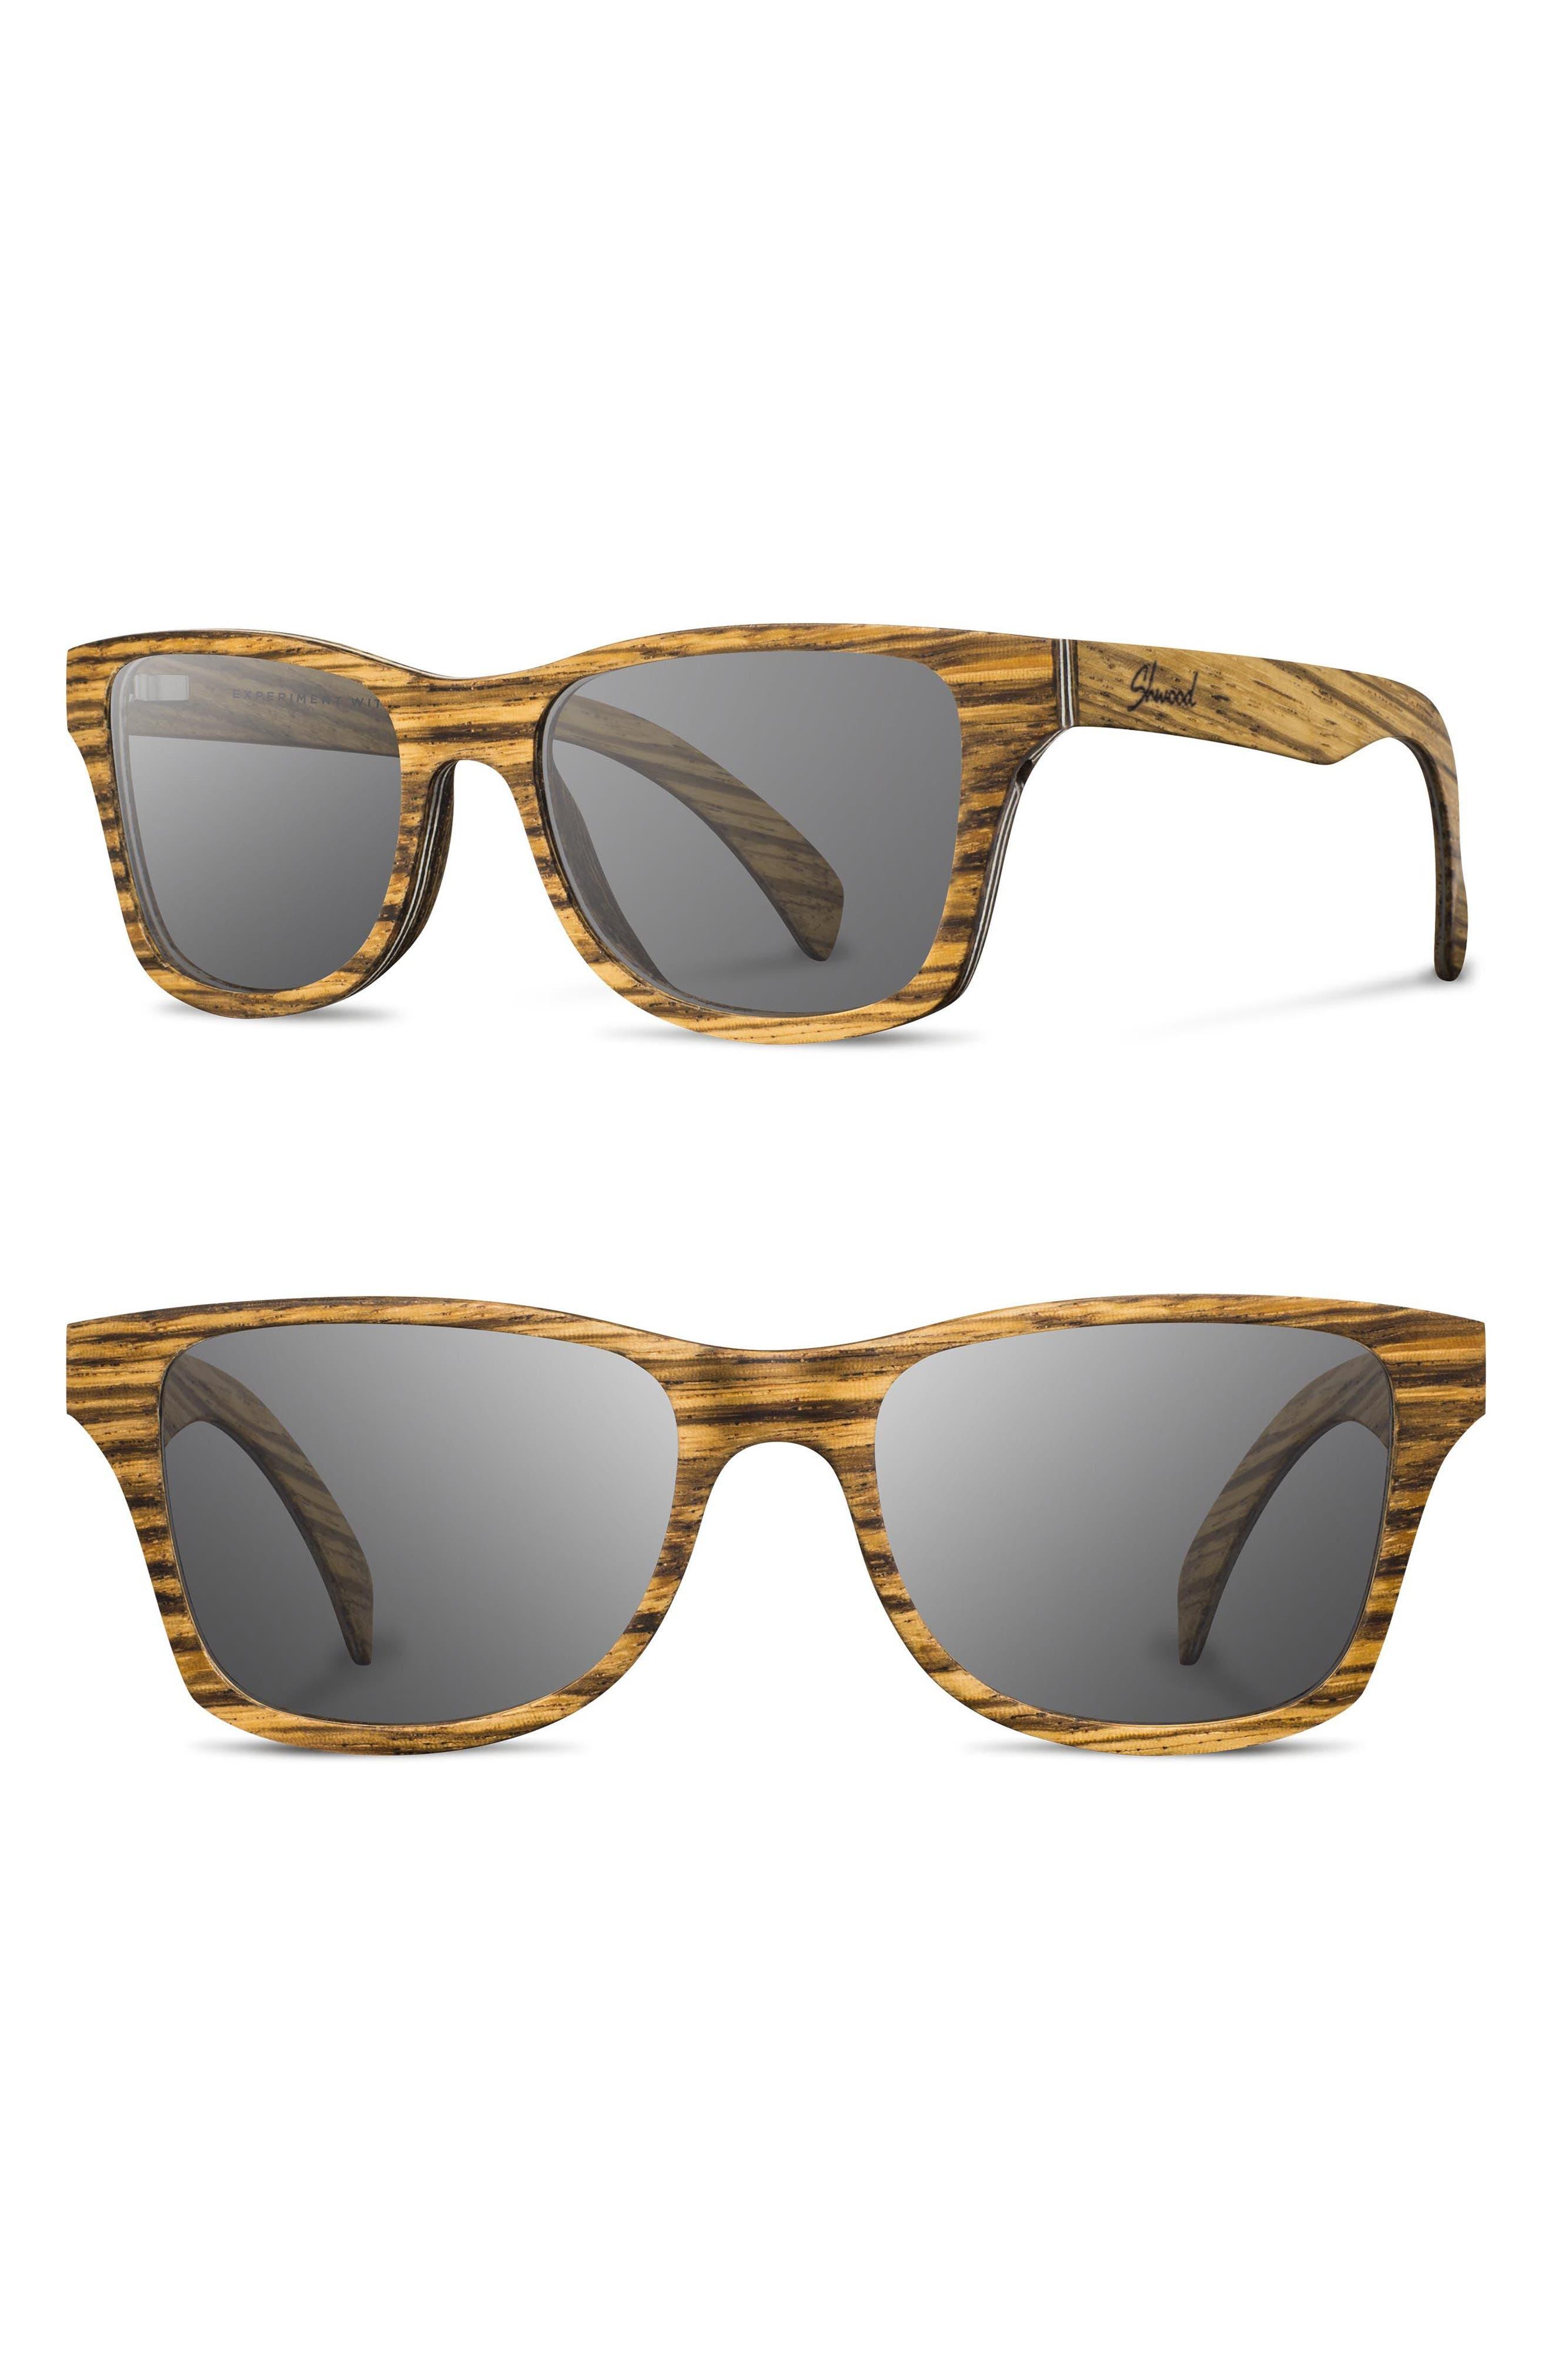 Shwood 'Canby' 54mm Wood Sunglasses